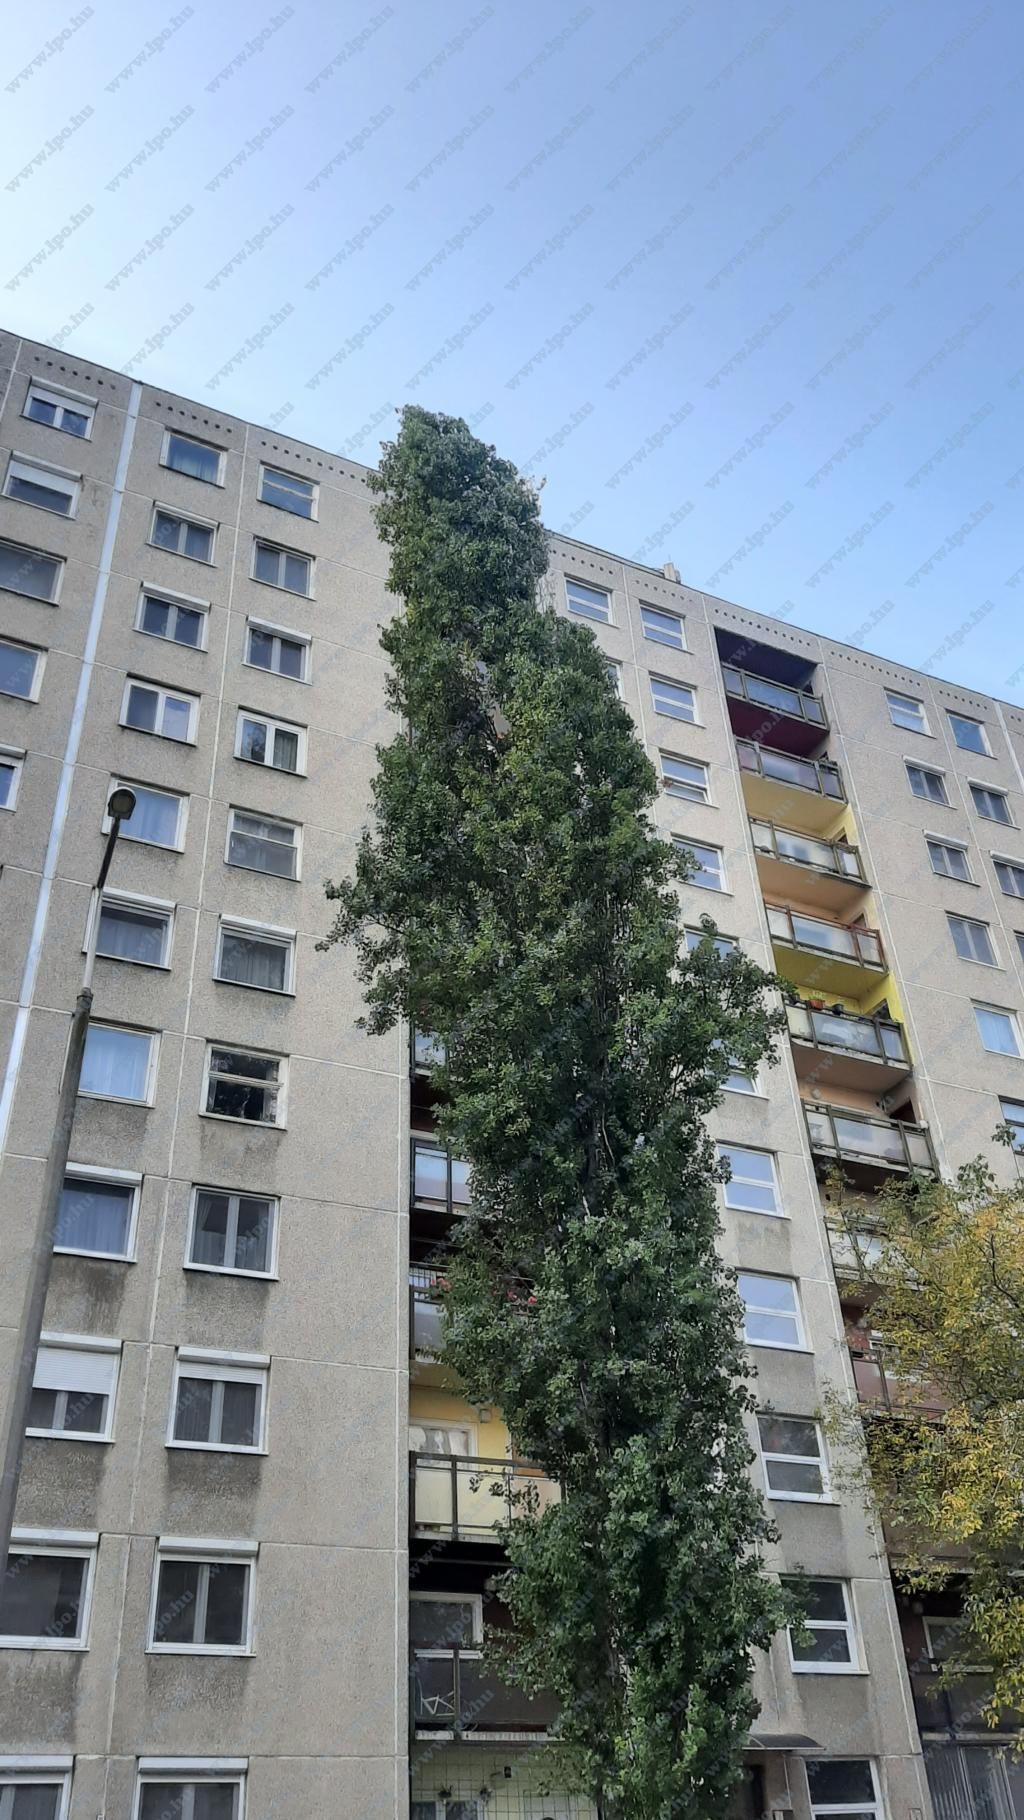 flat For sale 1139 Budapest Petneházy utca 49sqm 34,9M HUF Property image: 1